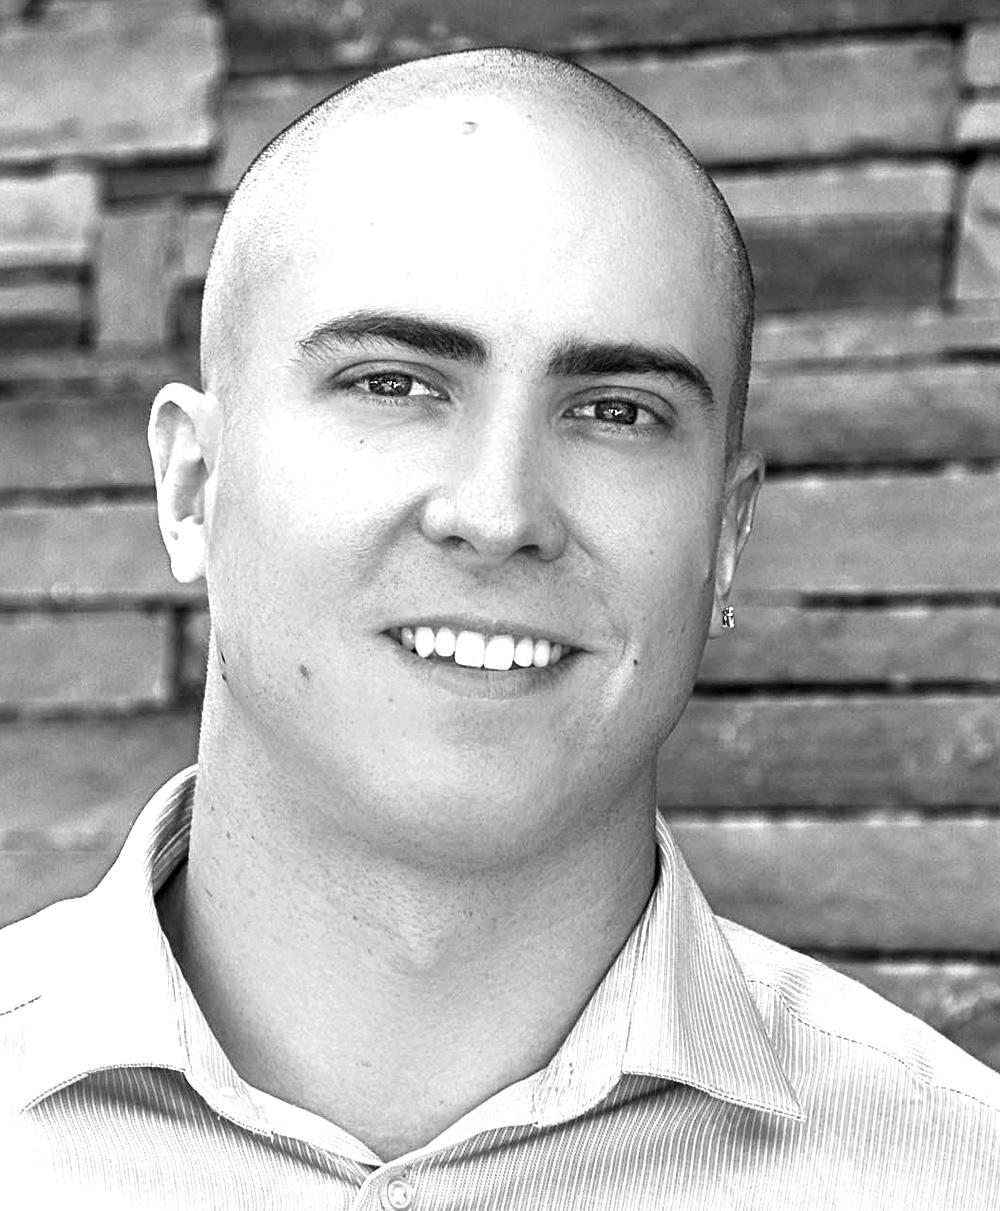 Headshot of Paul Perejma